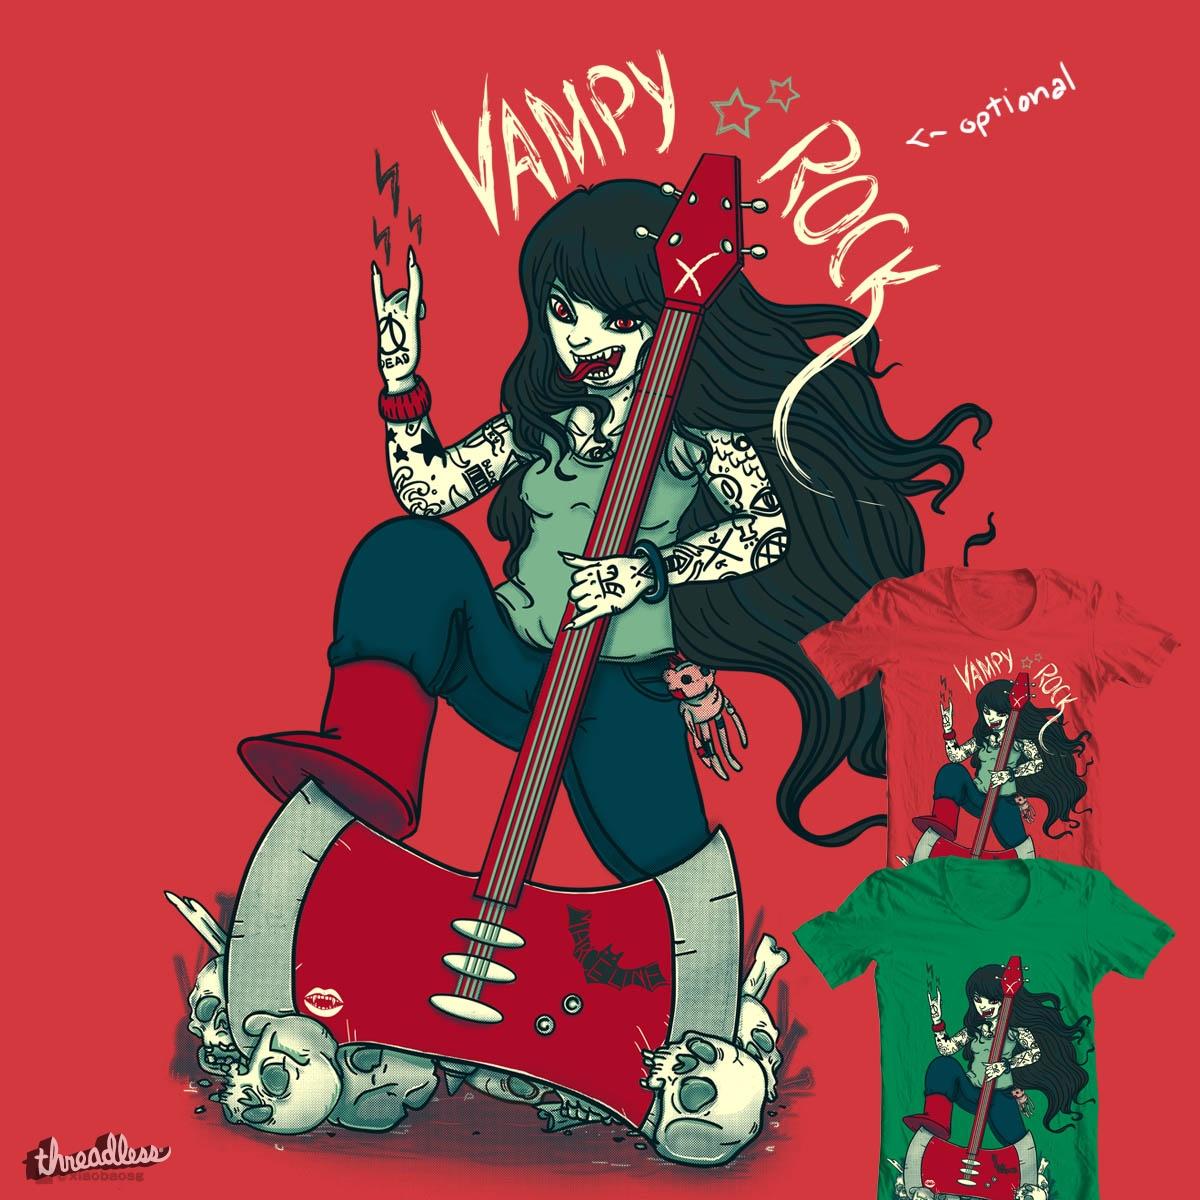 Vampy rock by xiaobaosg on Threadless